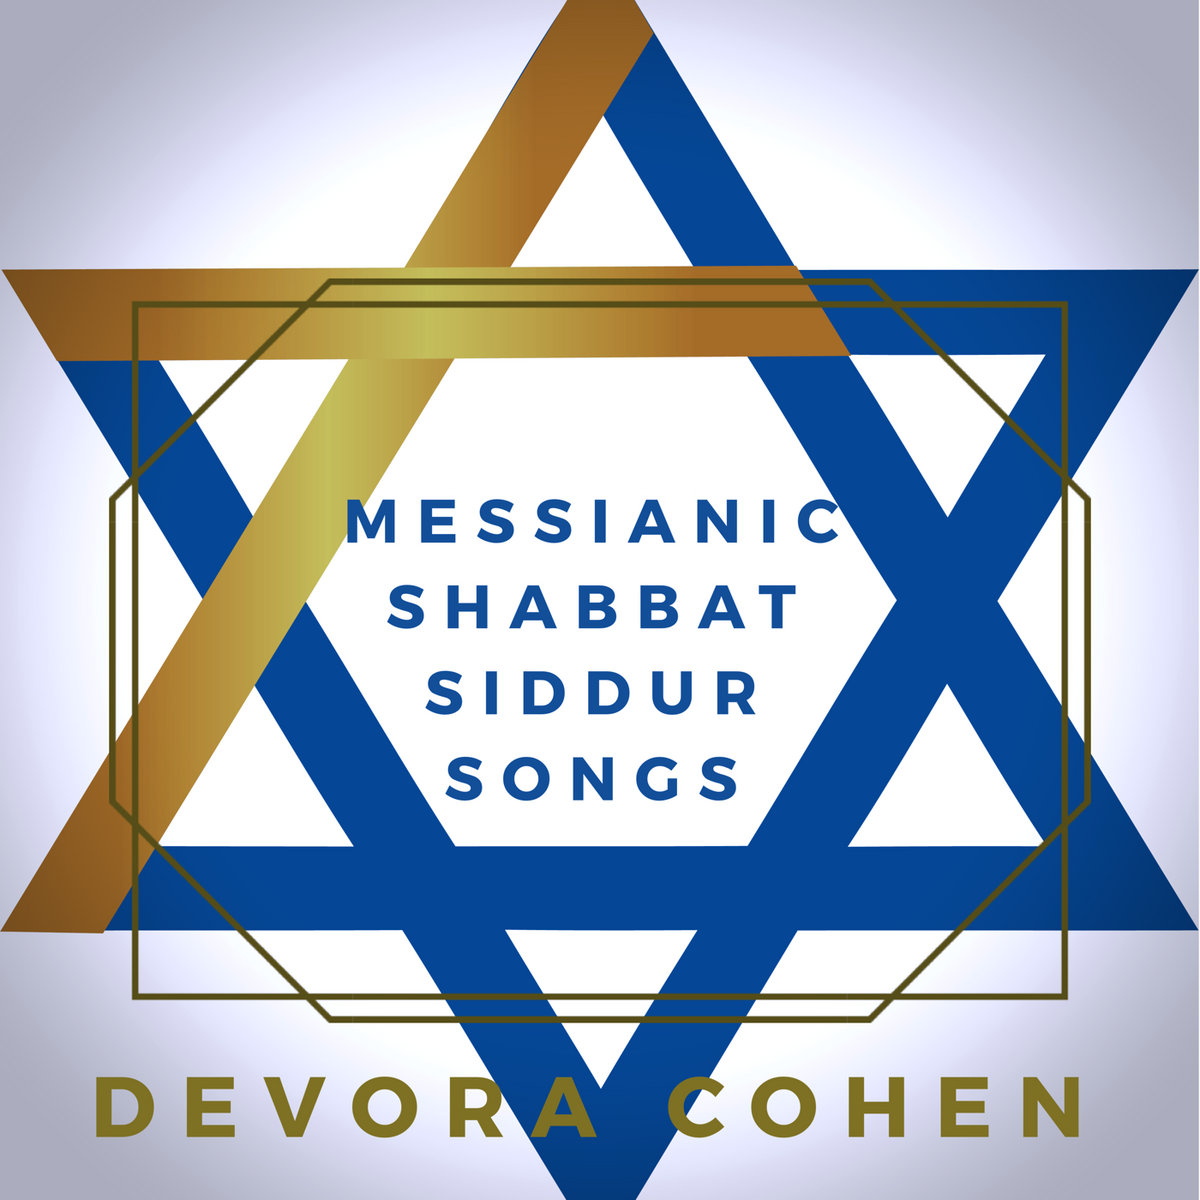 Messianic Shabbat Siddur Songs (13 Songs) | Devora Clark COHEN